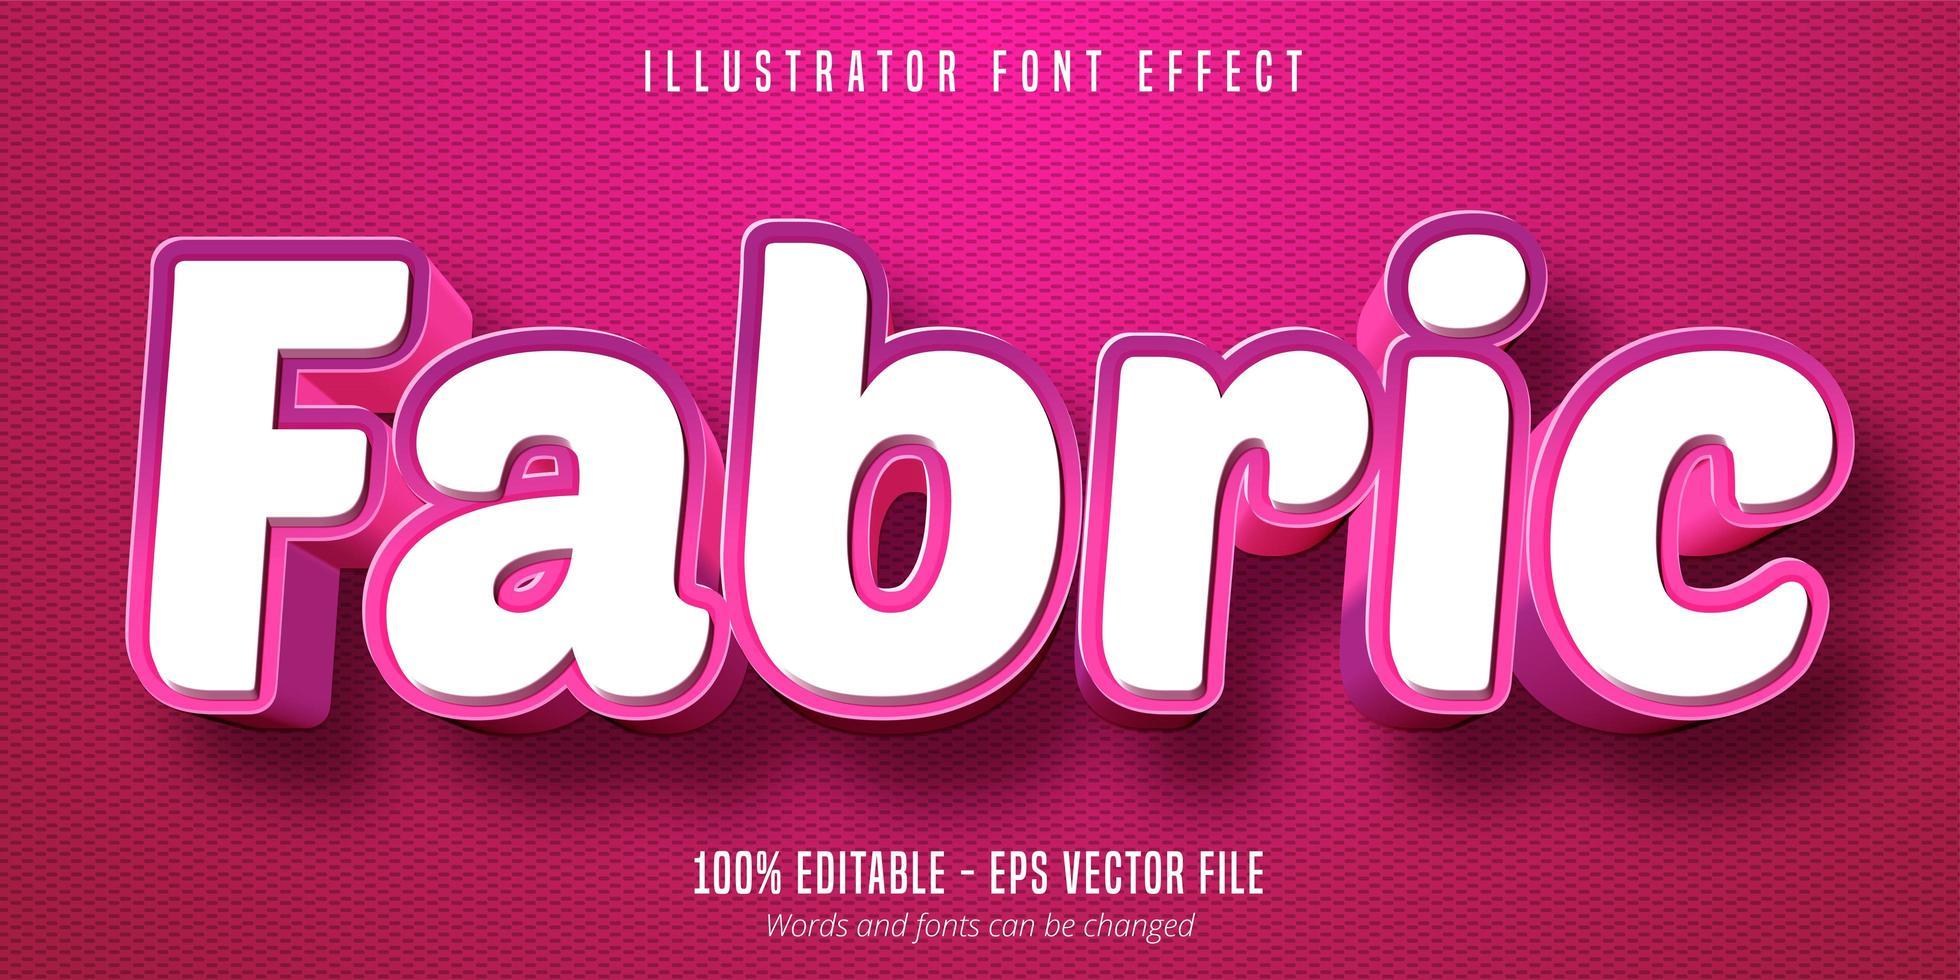 stof roze stijl lettertype-effect vector